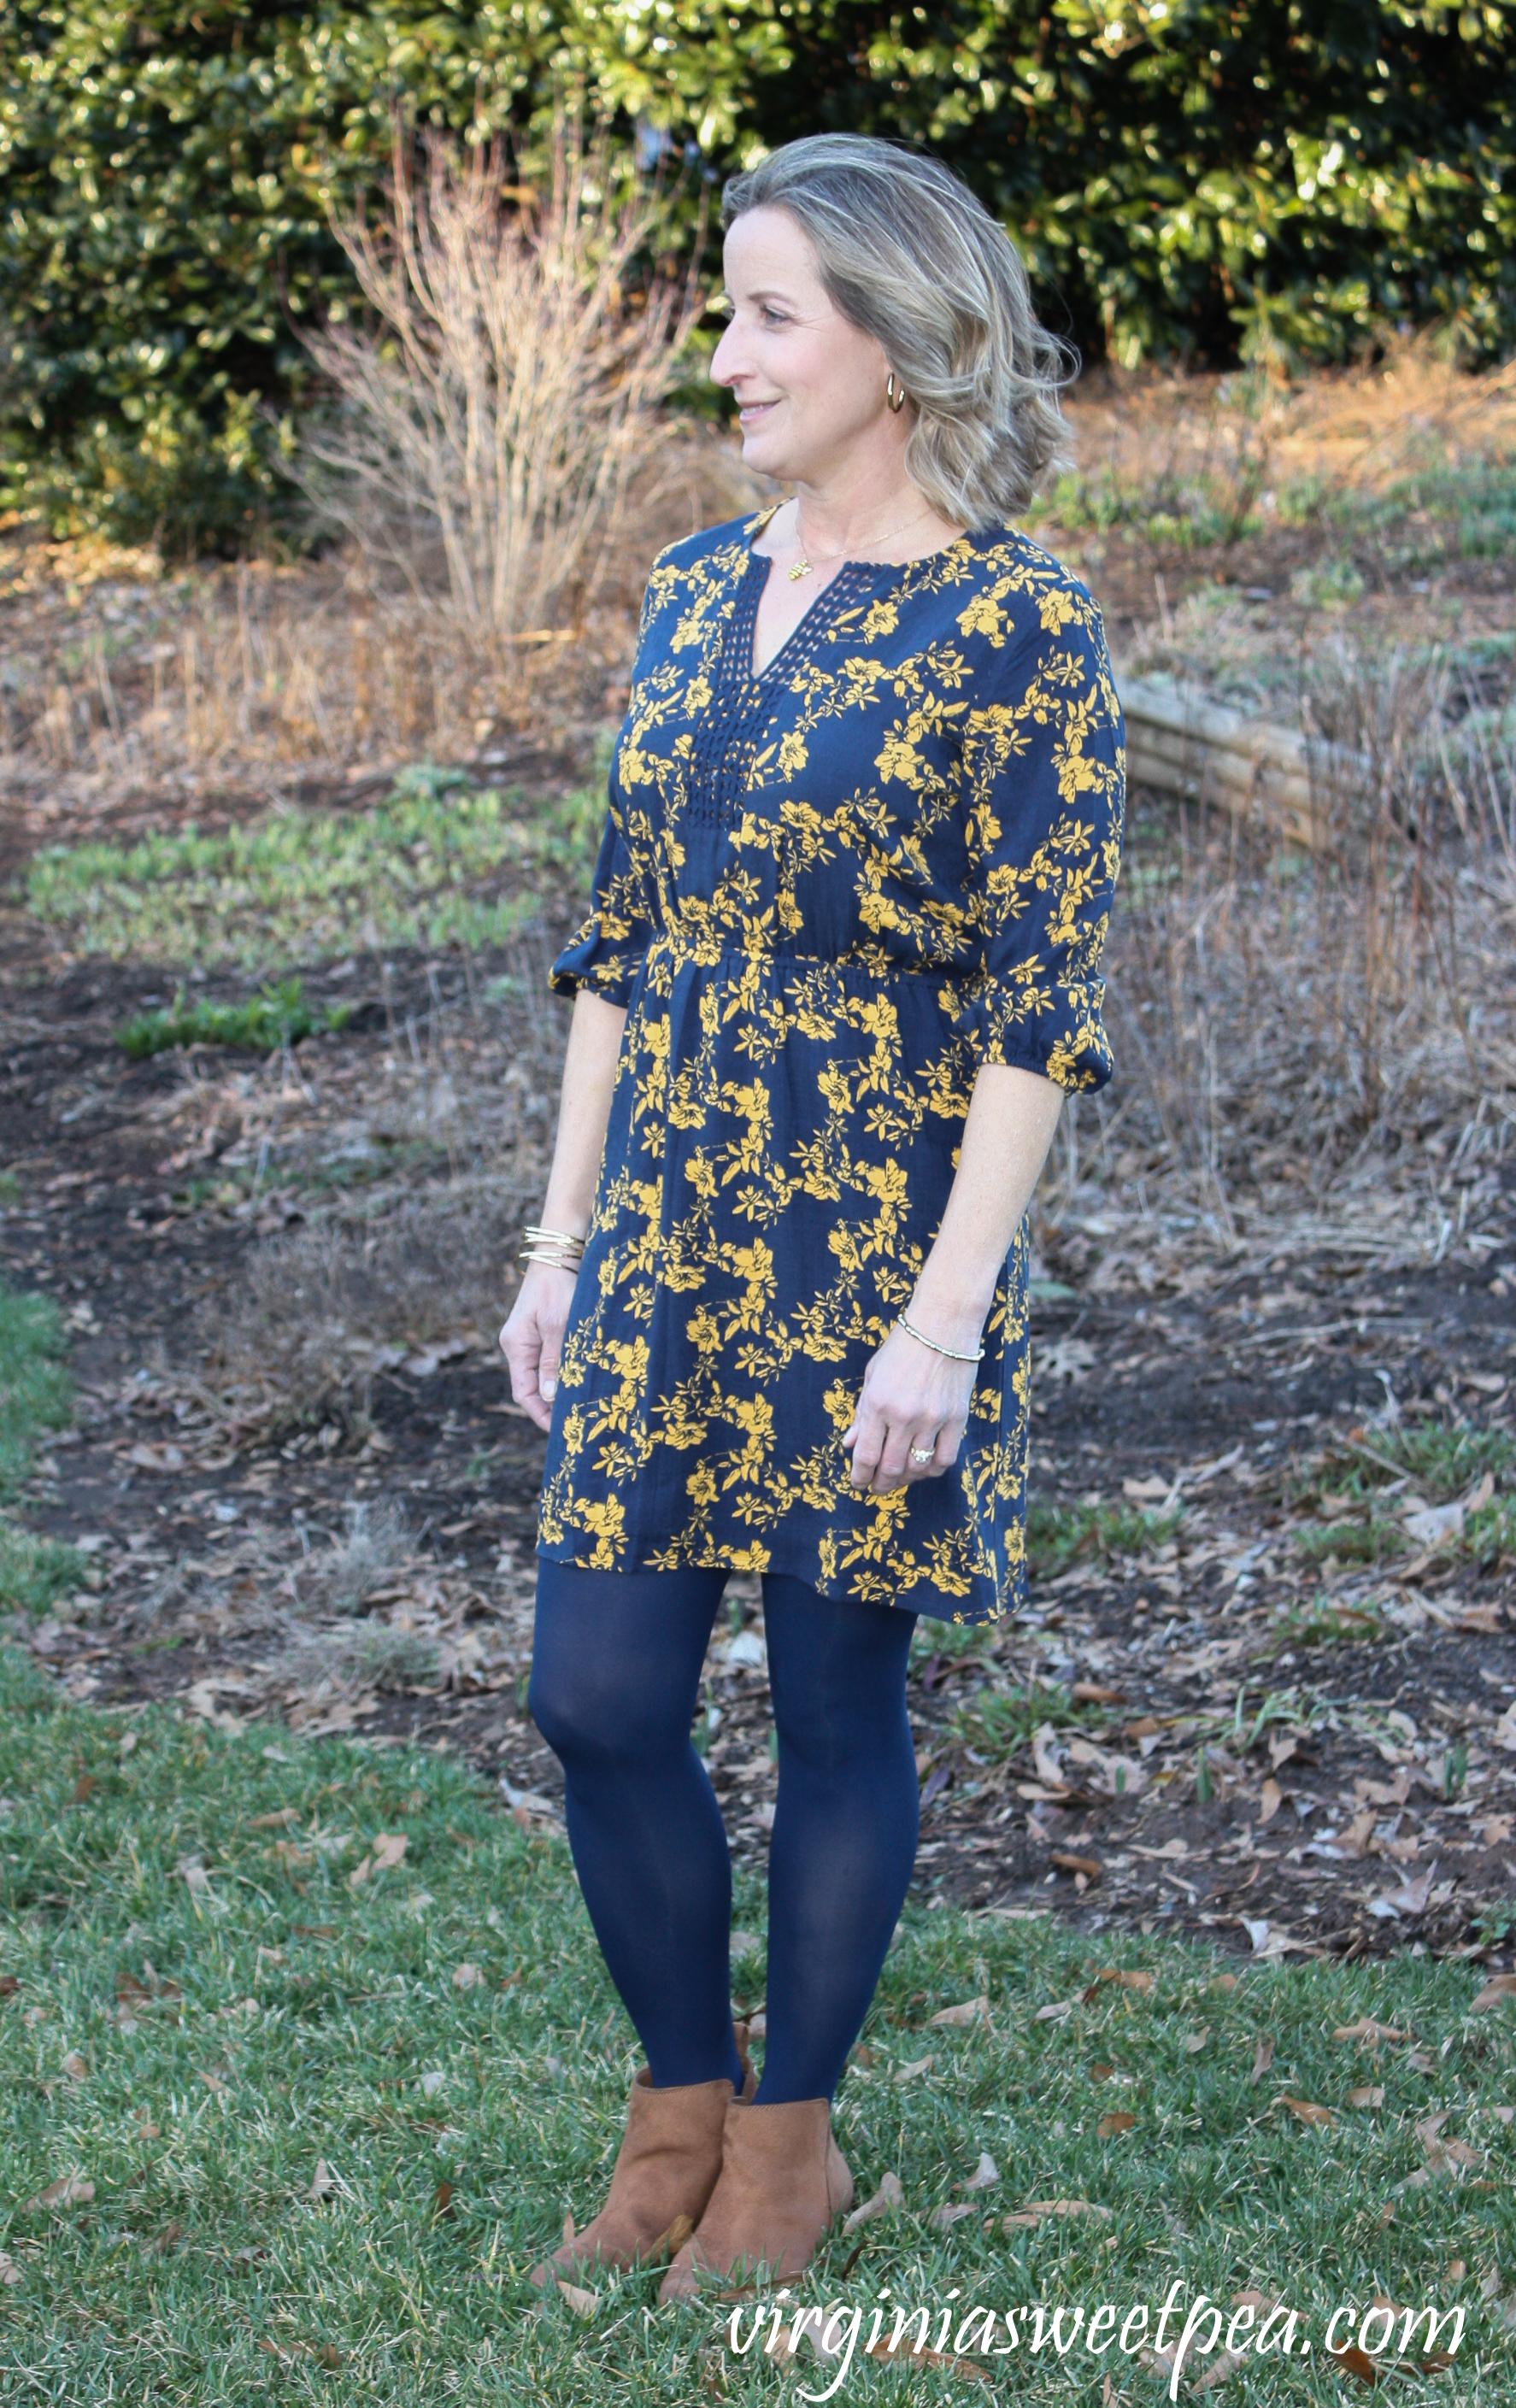 Stitch Fix Review for March 2019 - Market & Spruce Prim Crochet Trim Dress #stitchfix #stitchfixreview #stitchfix2019 #stitchfixspring #stitchfixdress #shermanskulina